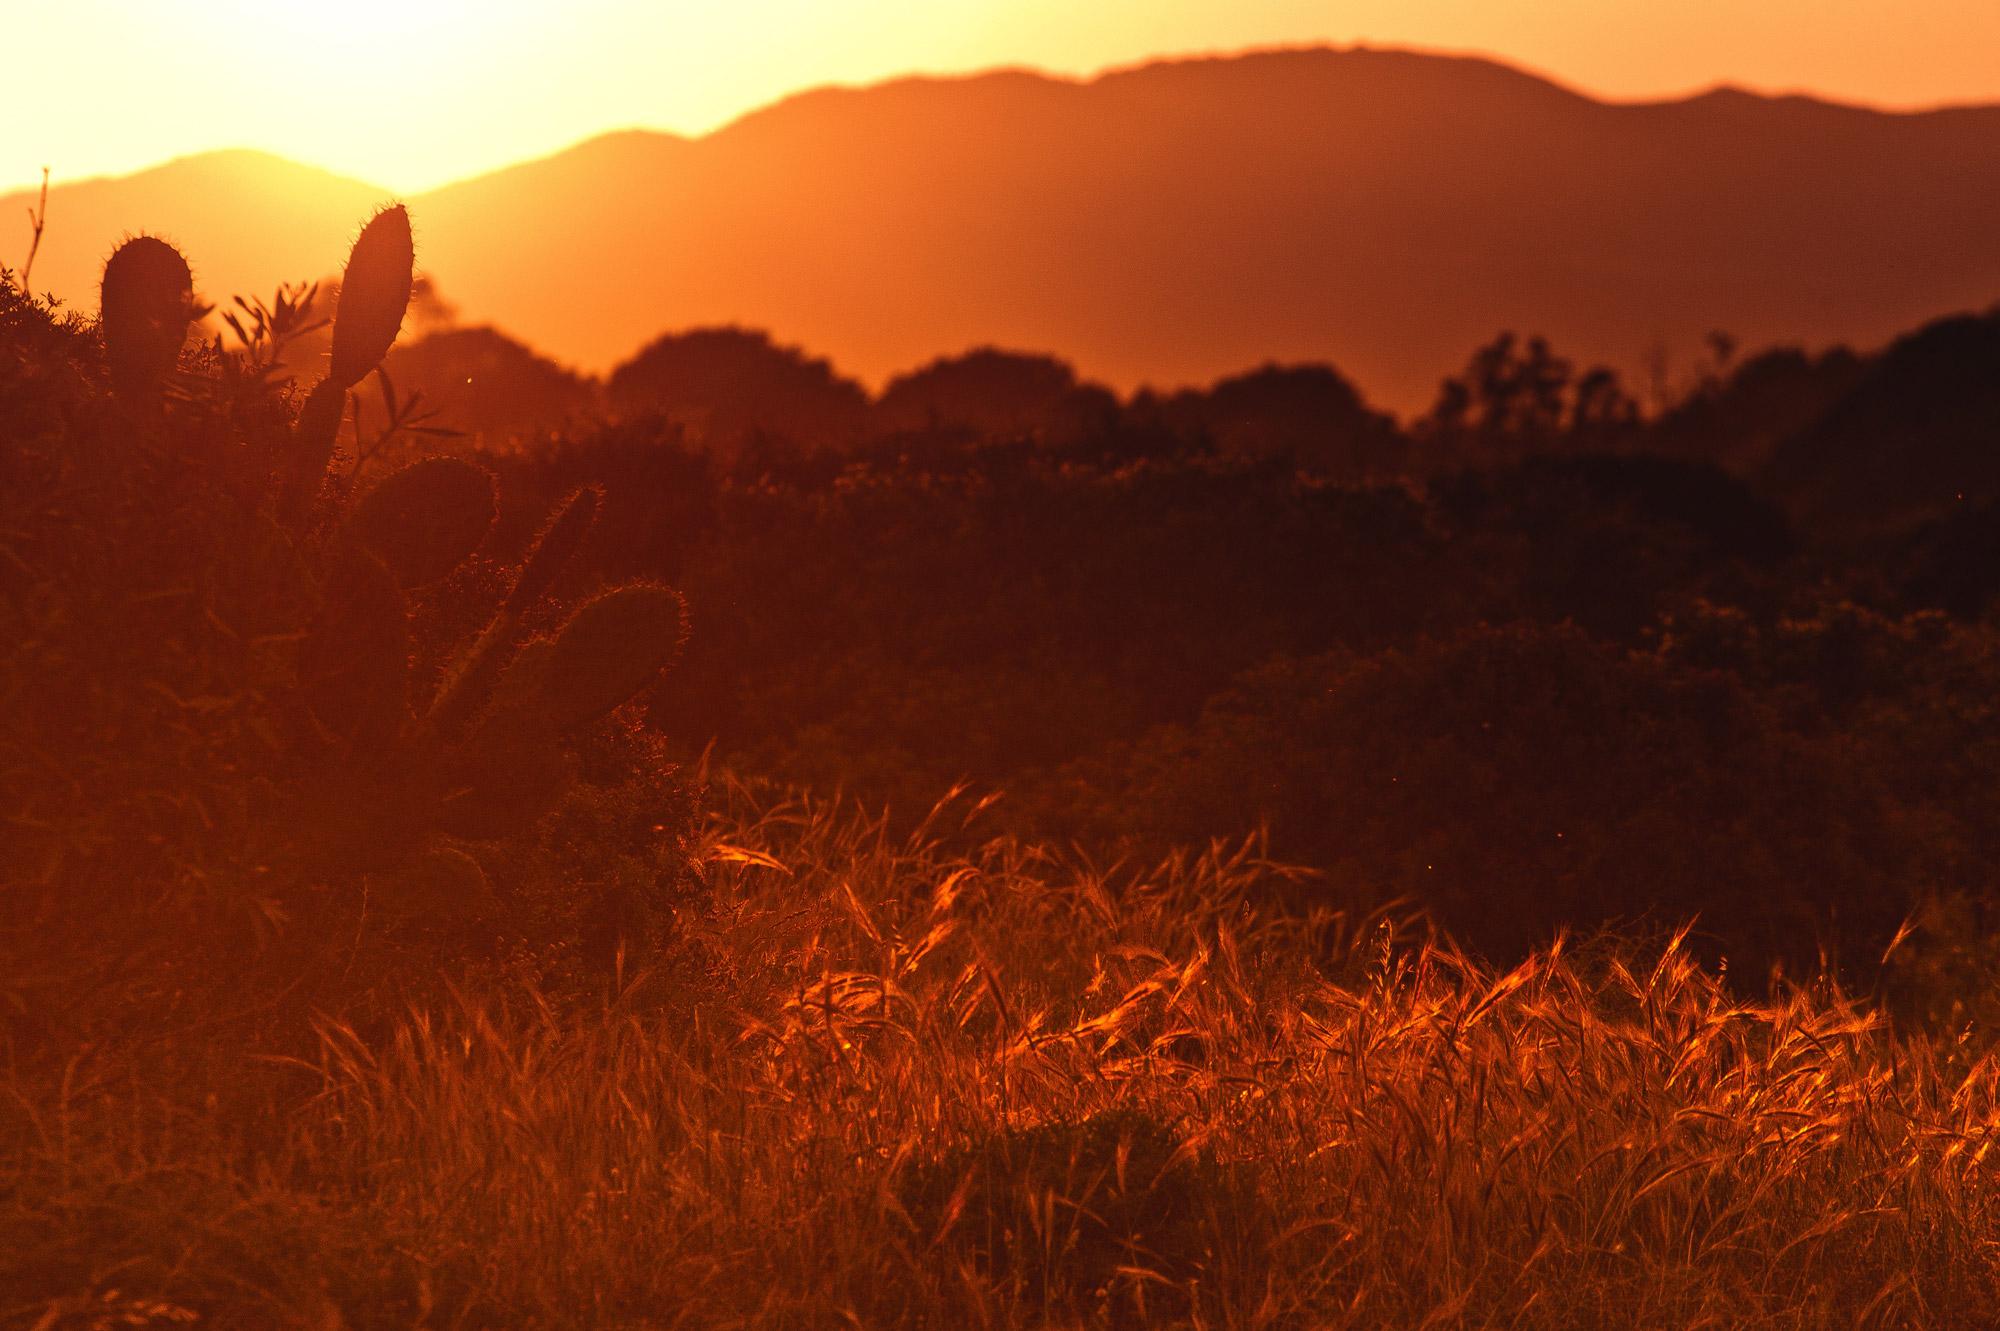 iwfruyqpcbq-loreta-pavoliene – Sonoran Prevention Works